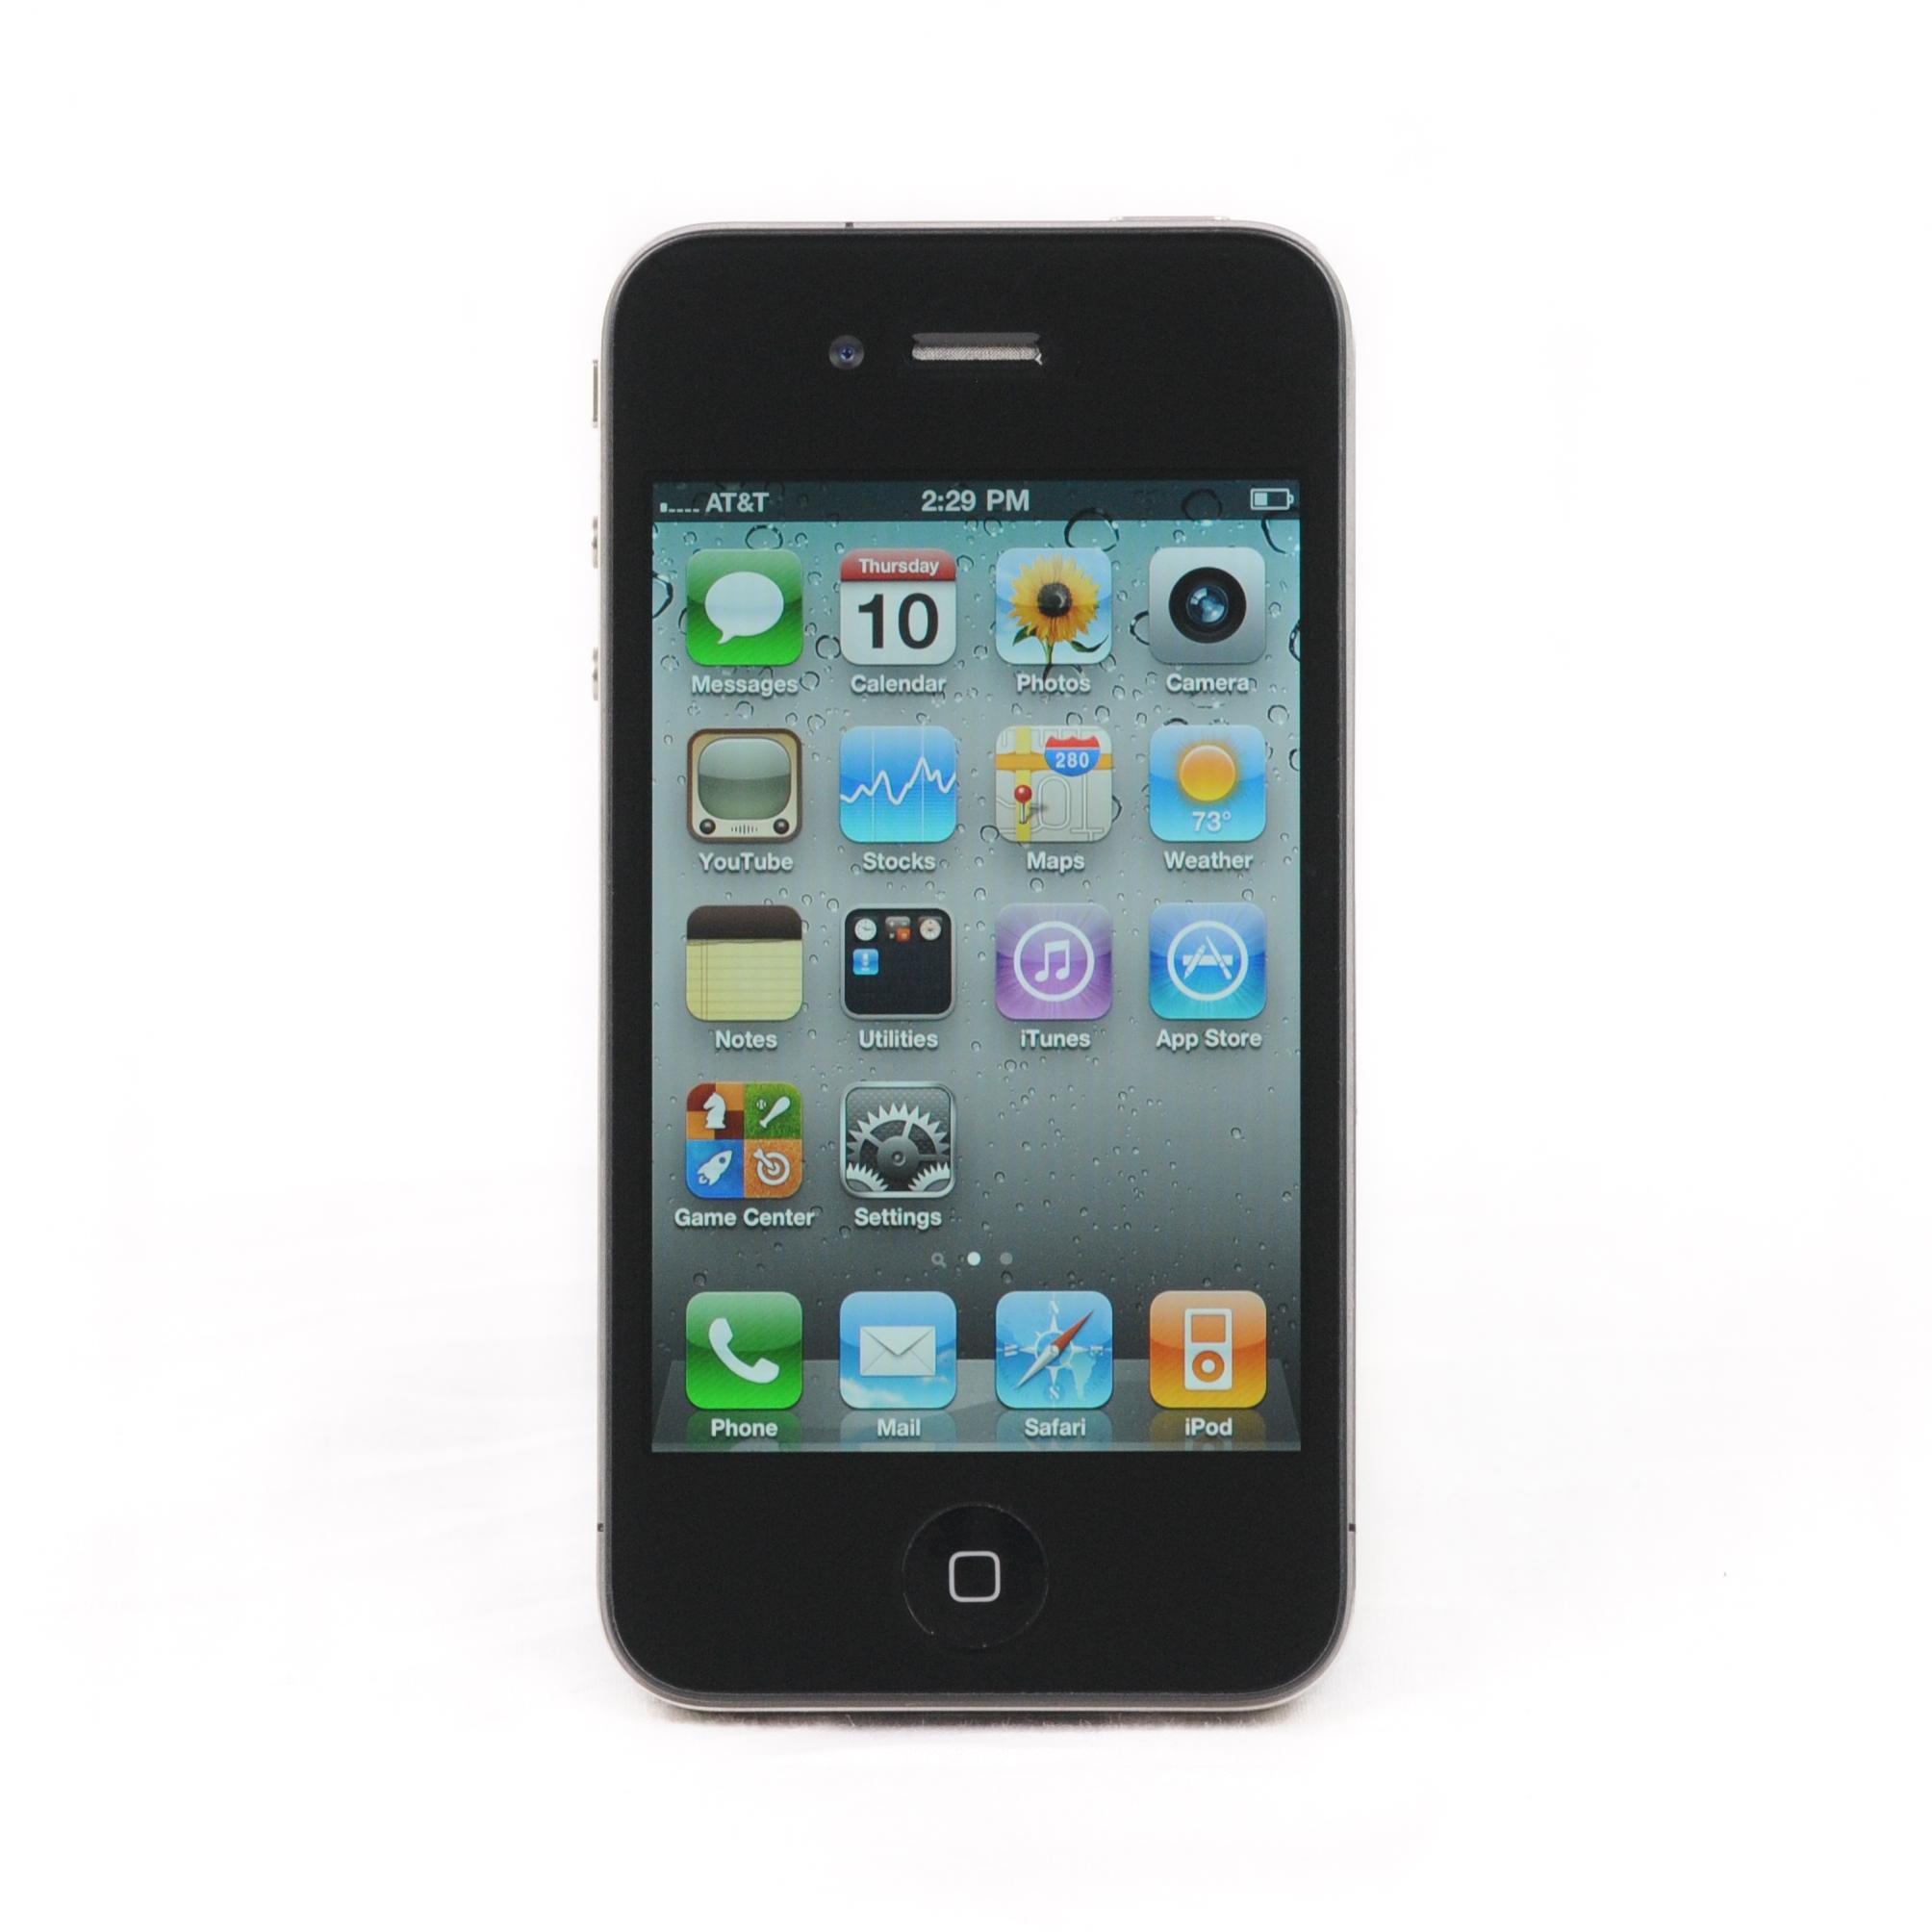 apple iphone 4 8gb fair condition black at t smartphone ebay